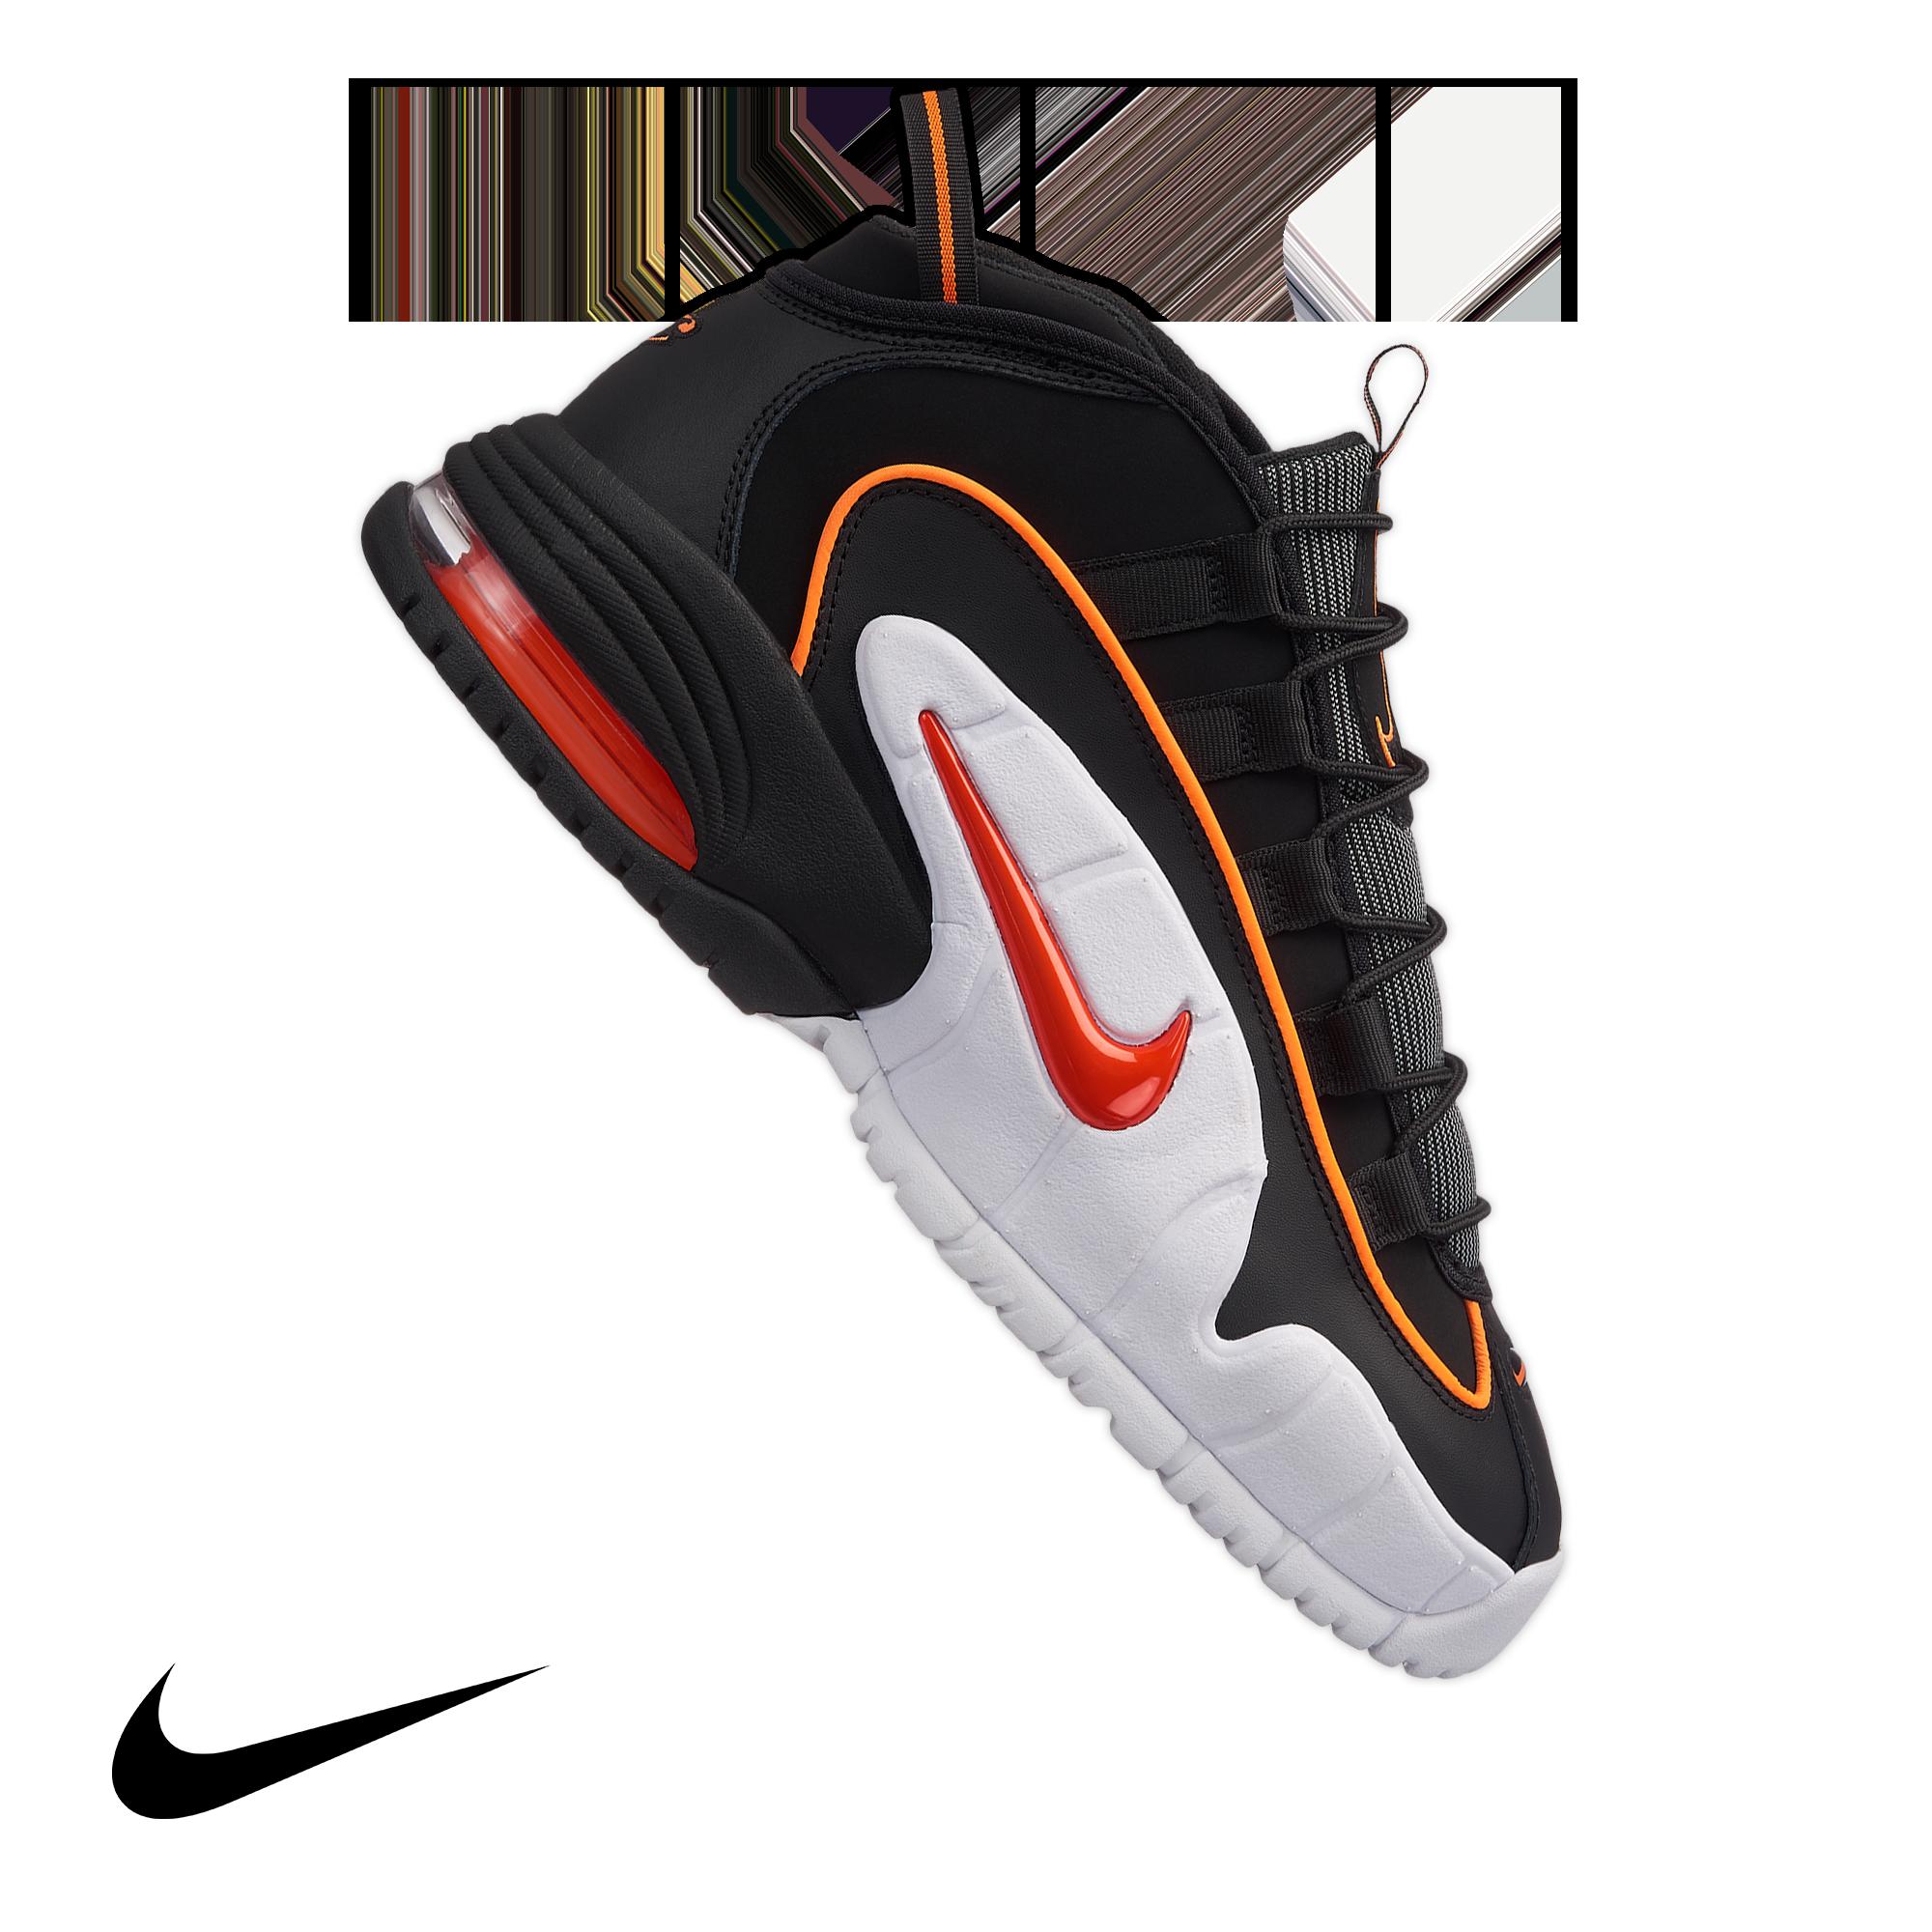 f1c57da44e92c lebron james special edition shoes nike free men